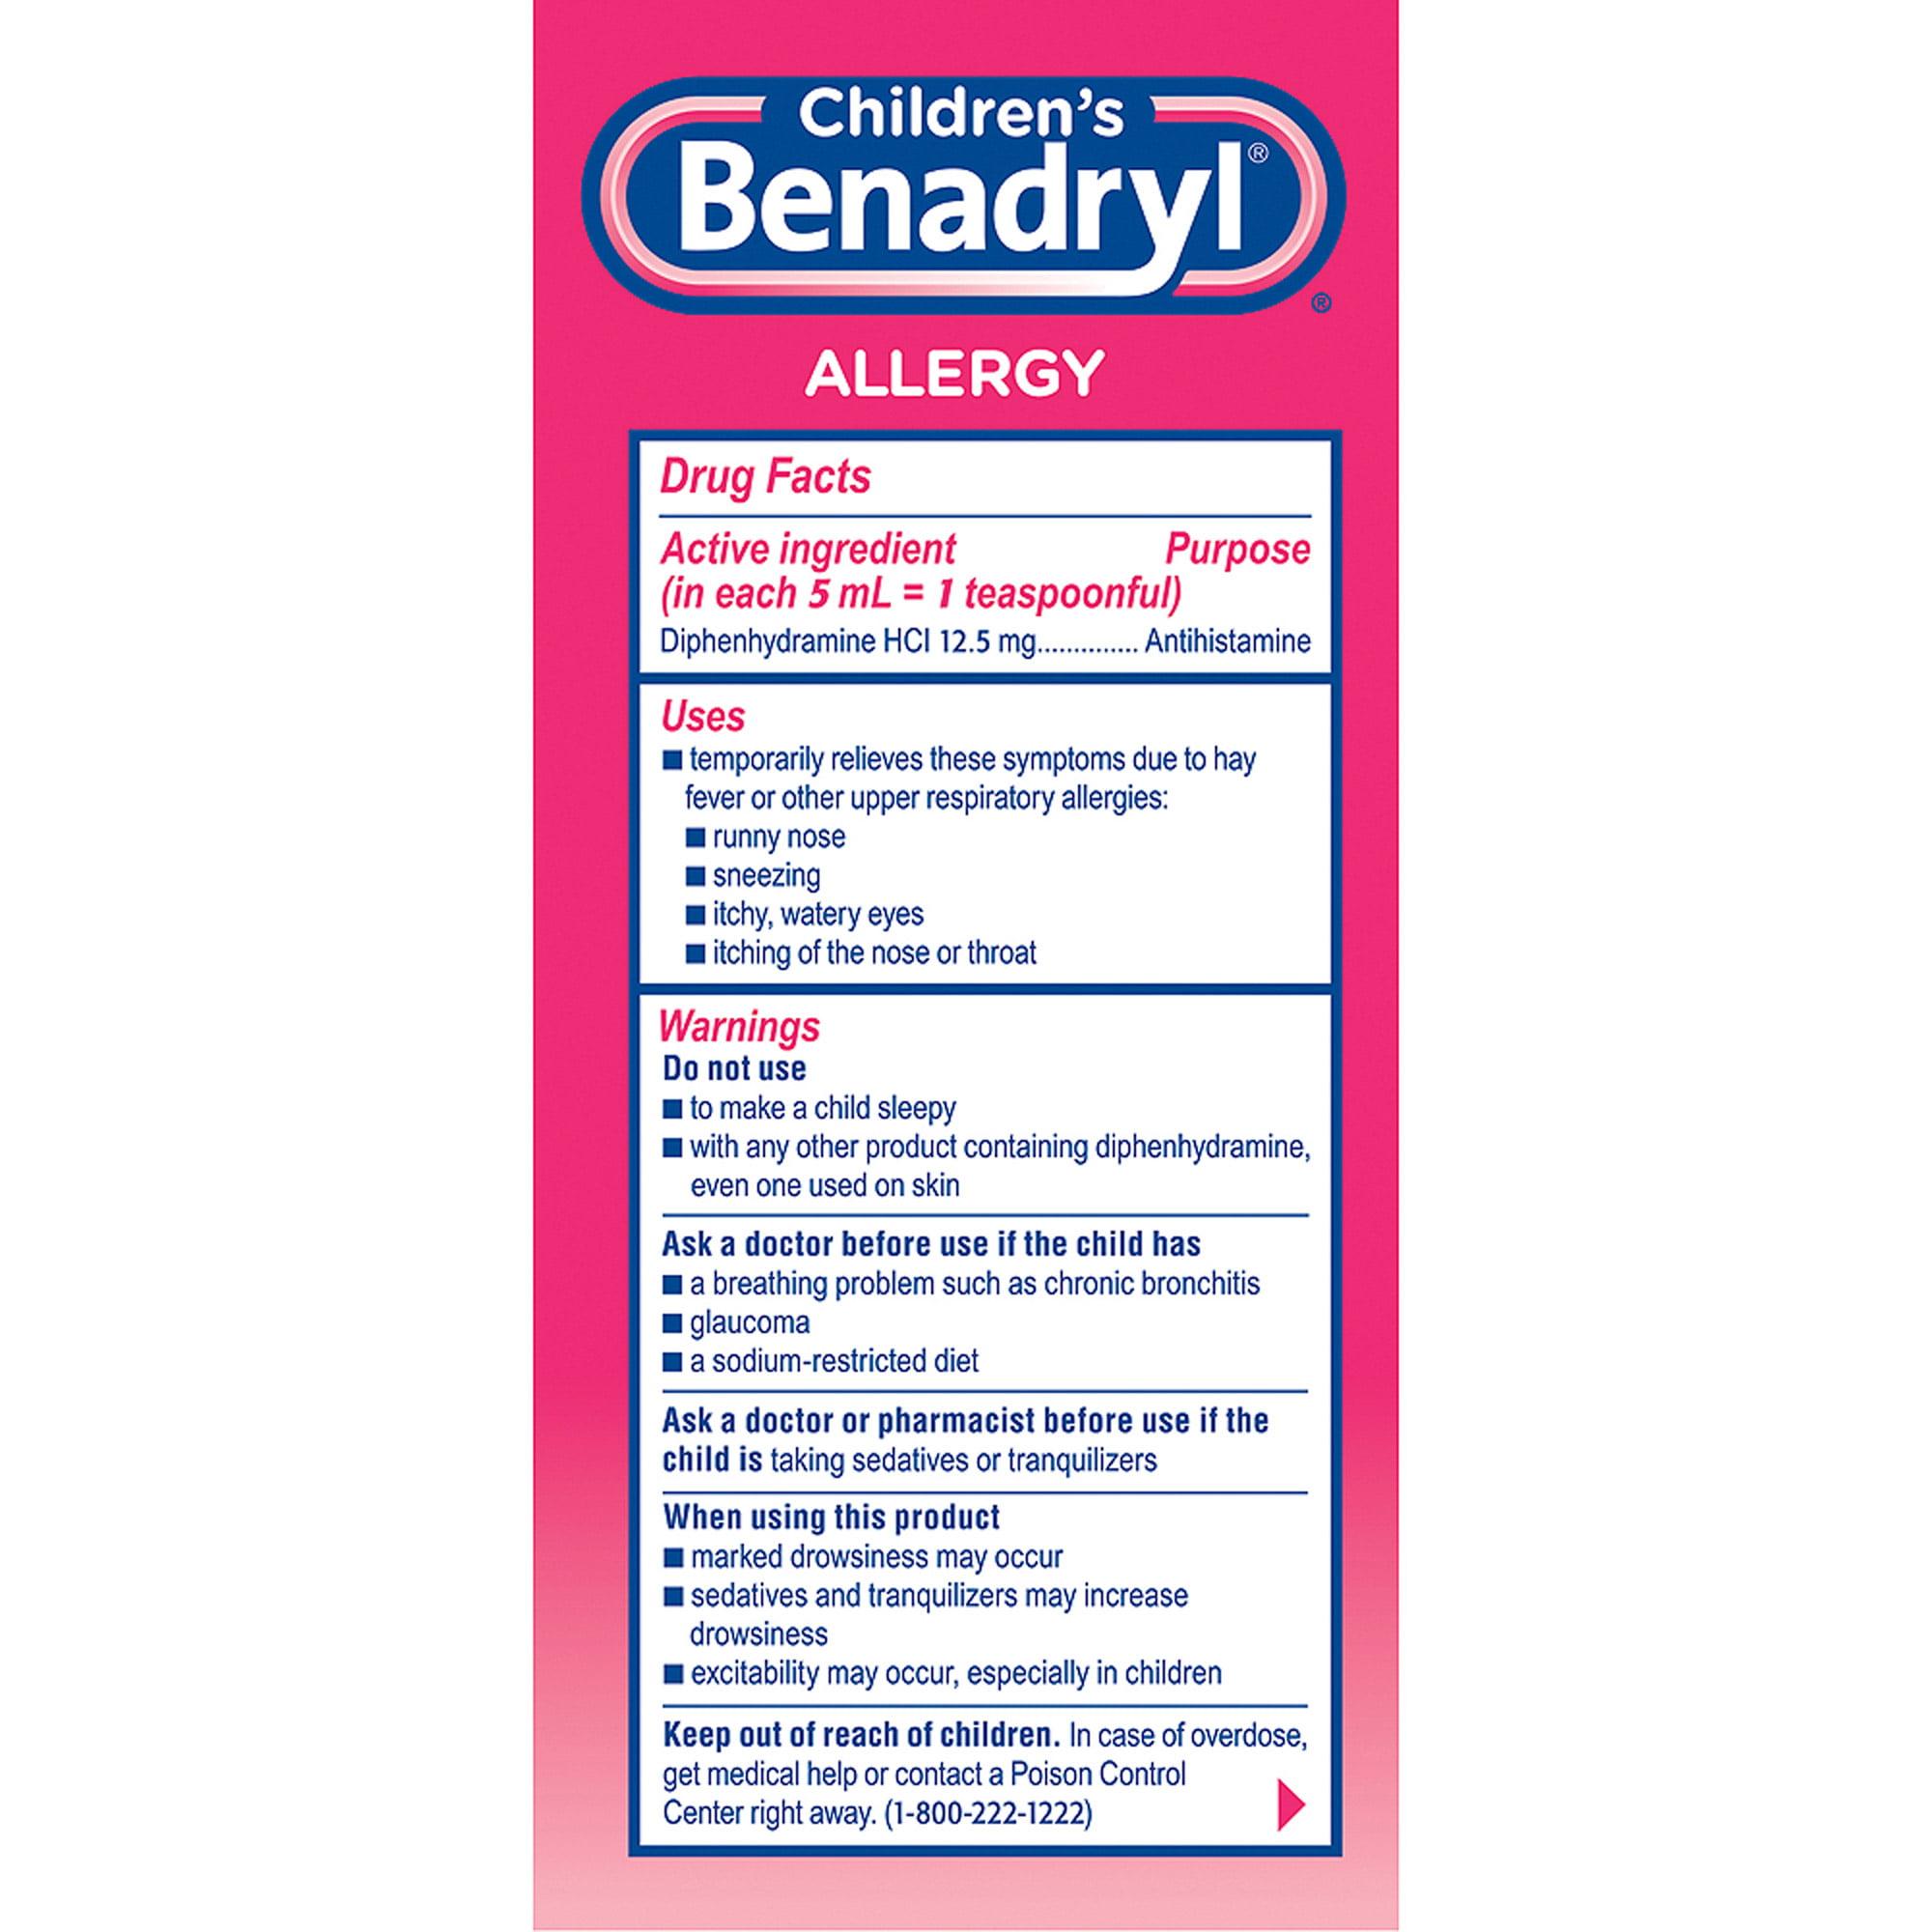 12.5mg benadryl 2 year old